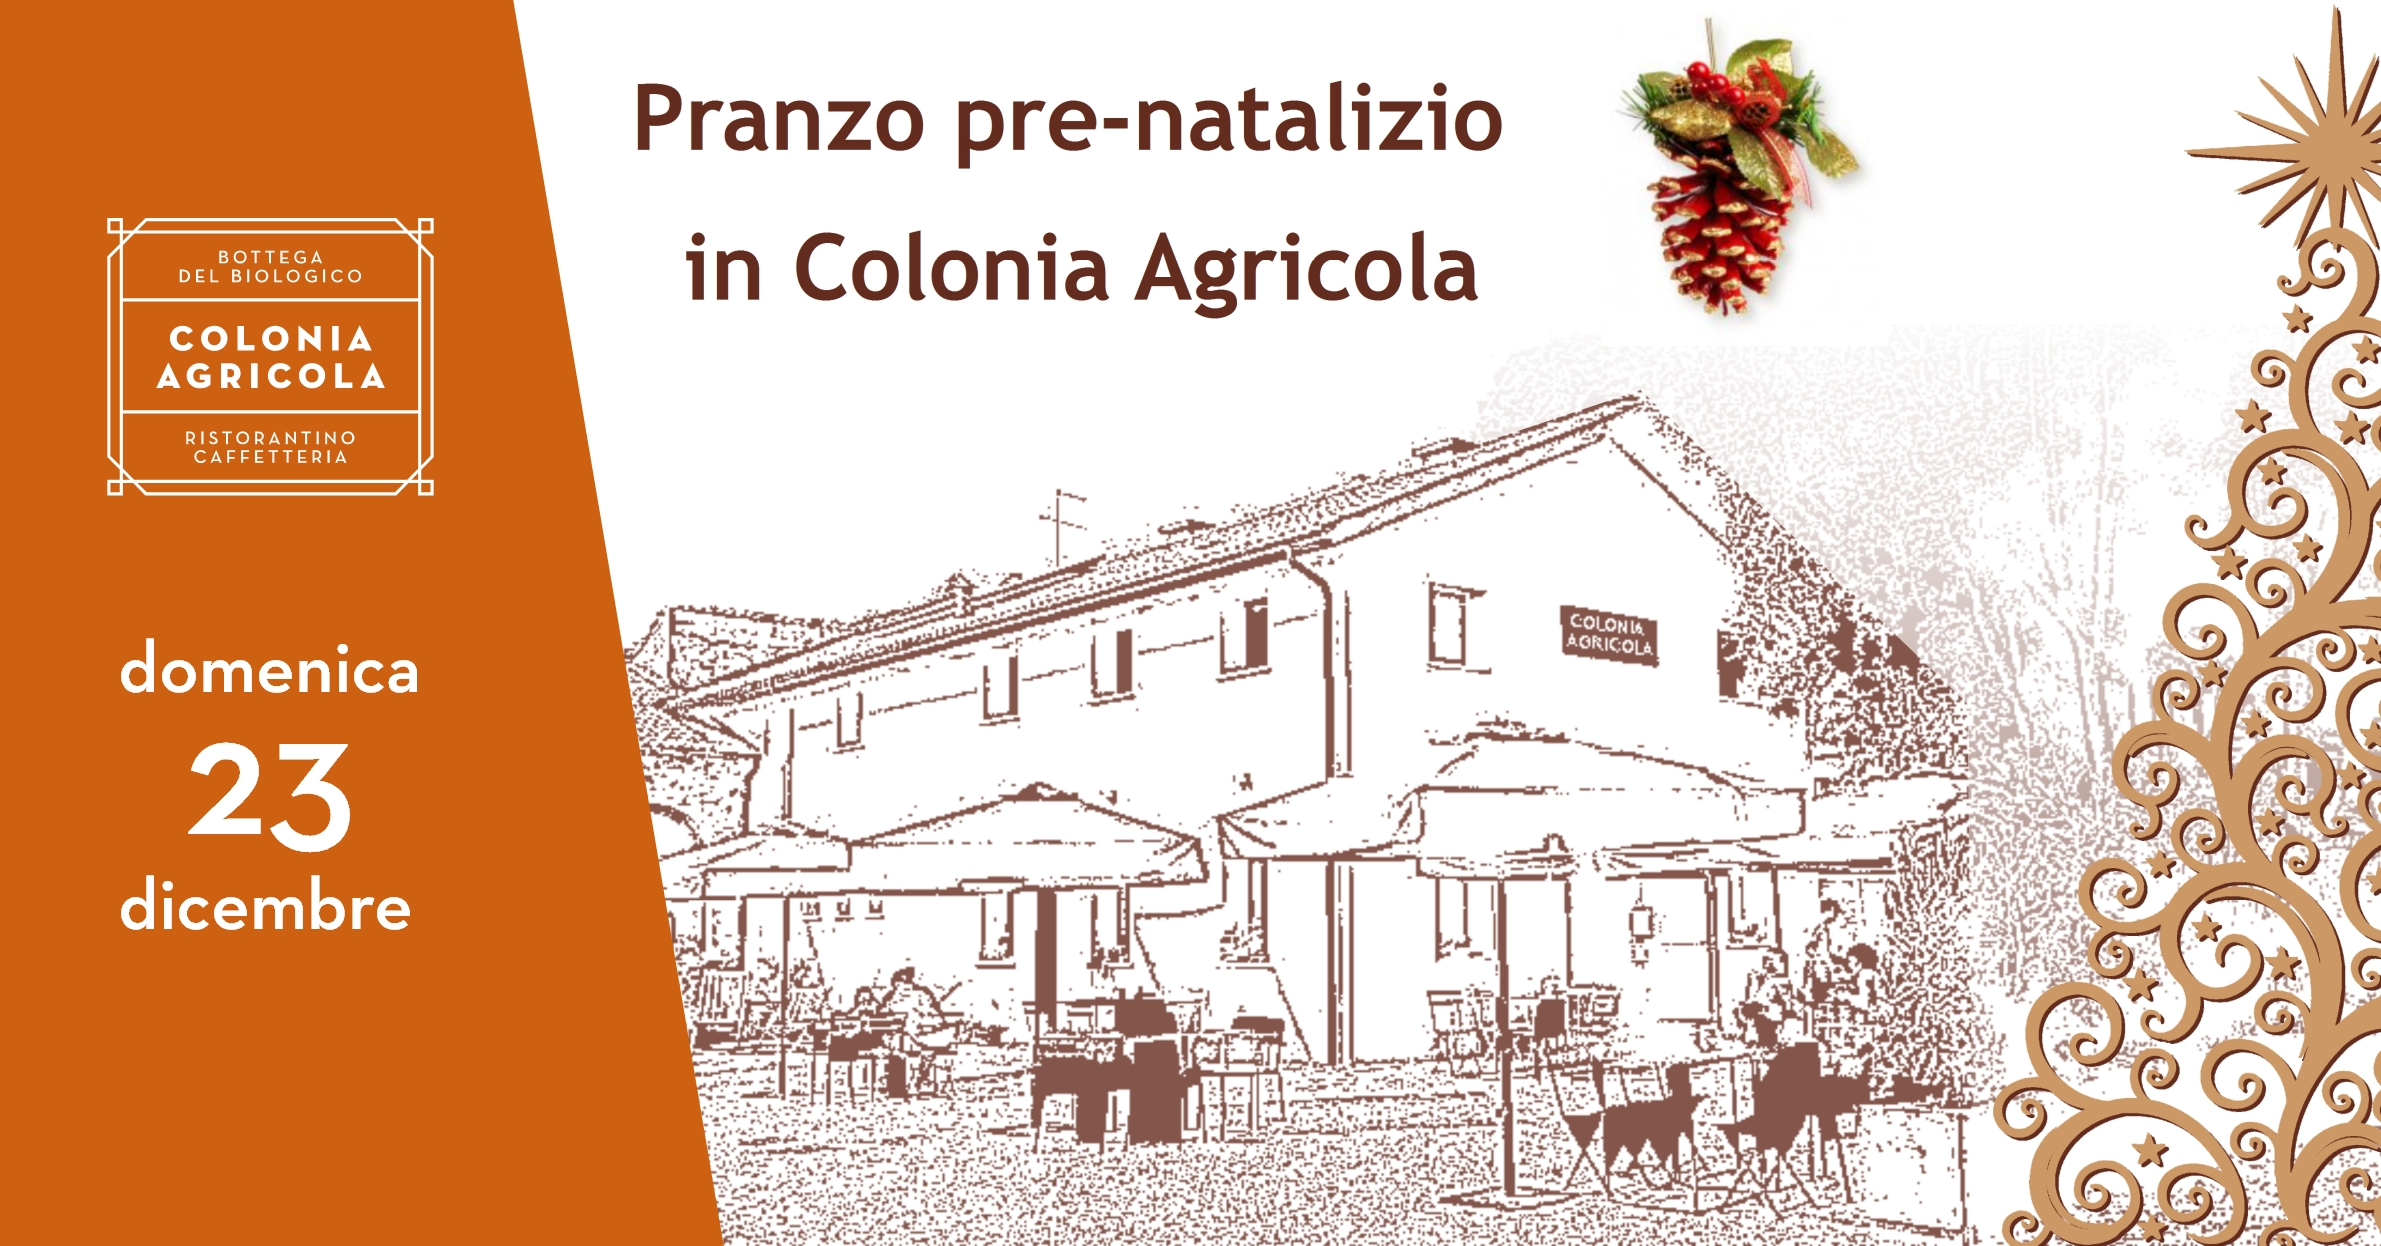 E0192_181223_Pranzo_Ristorantino_1_XSOC